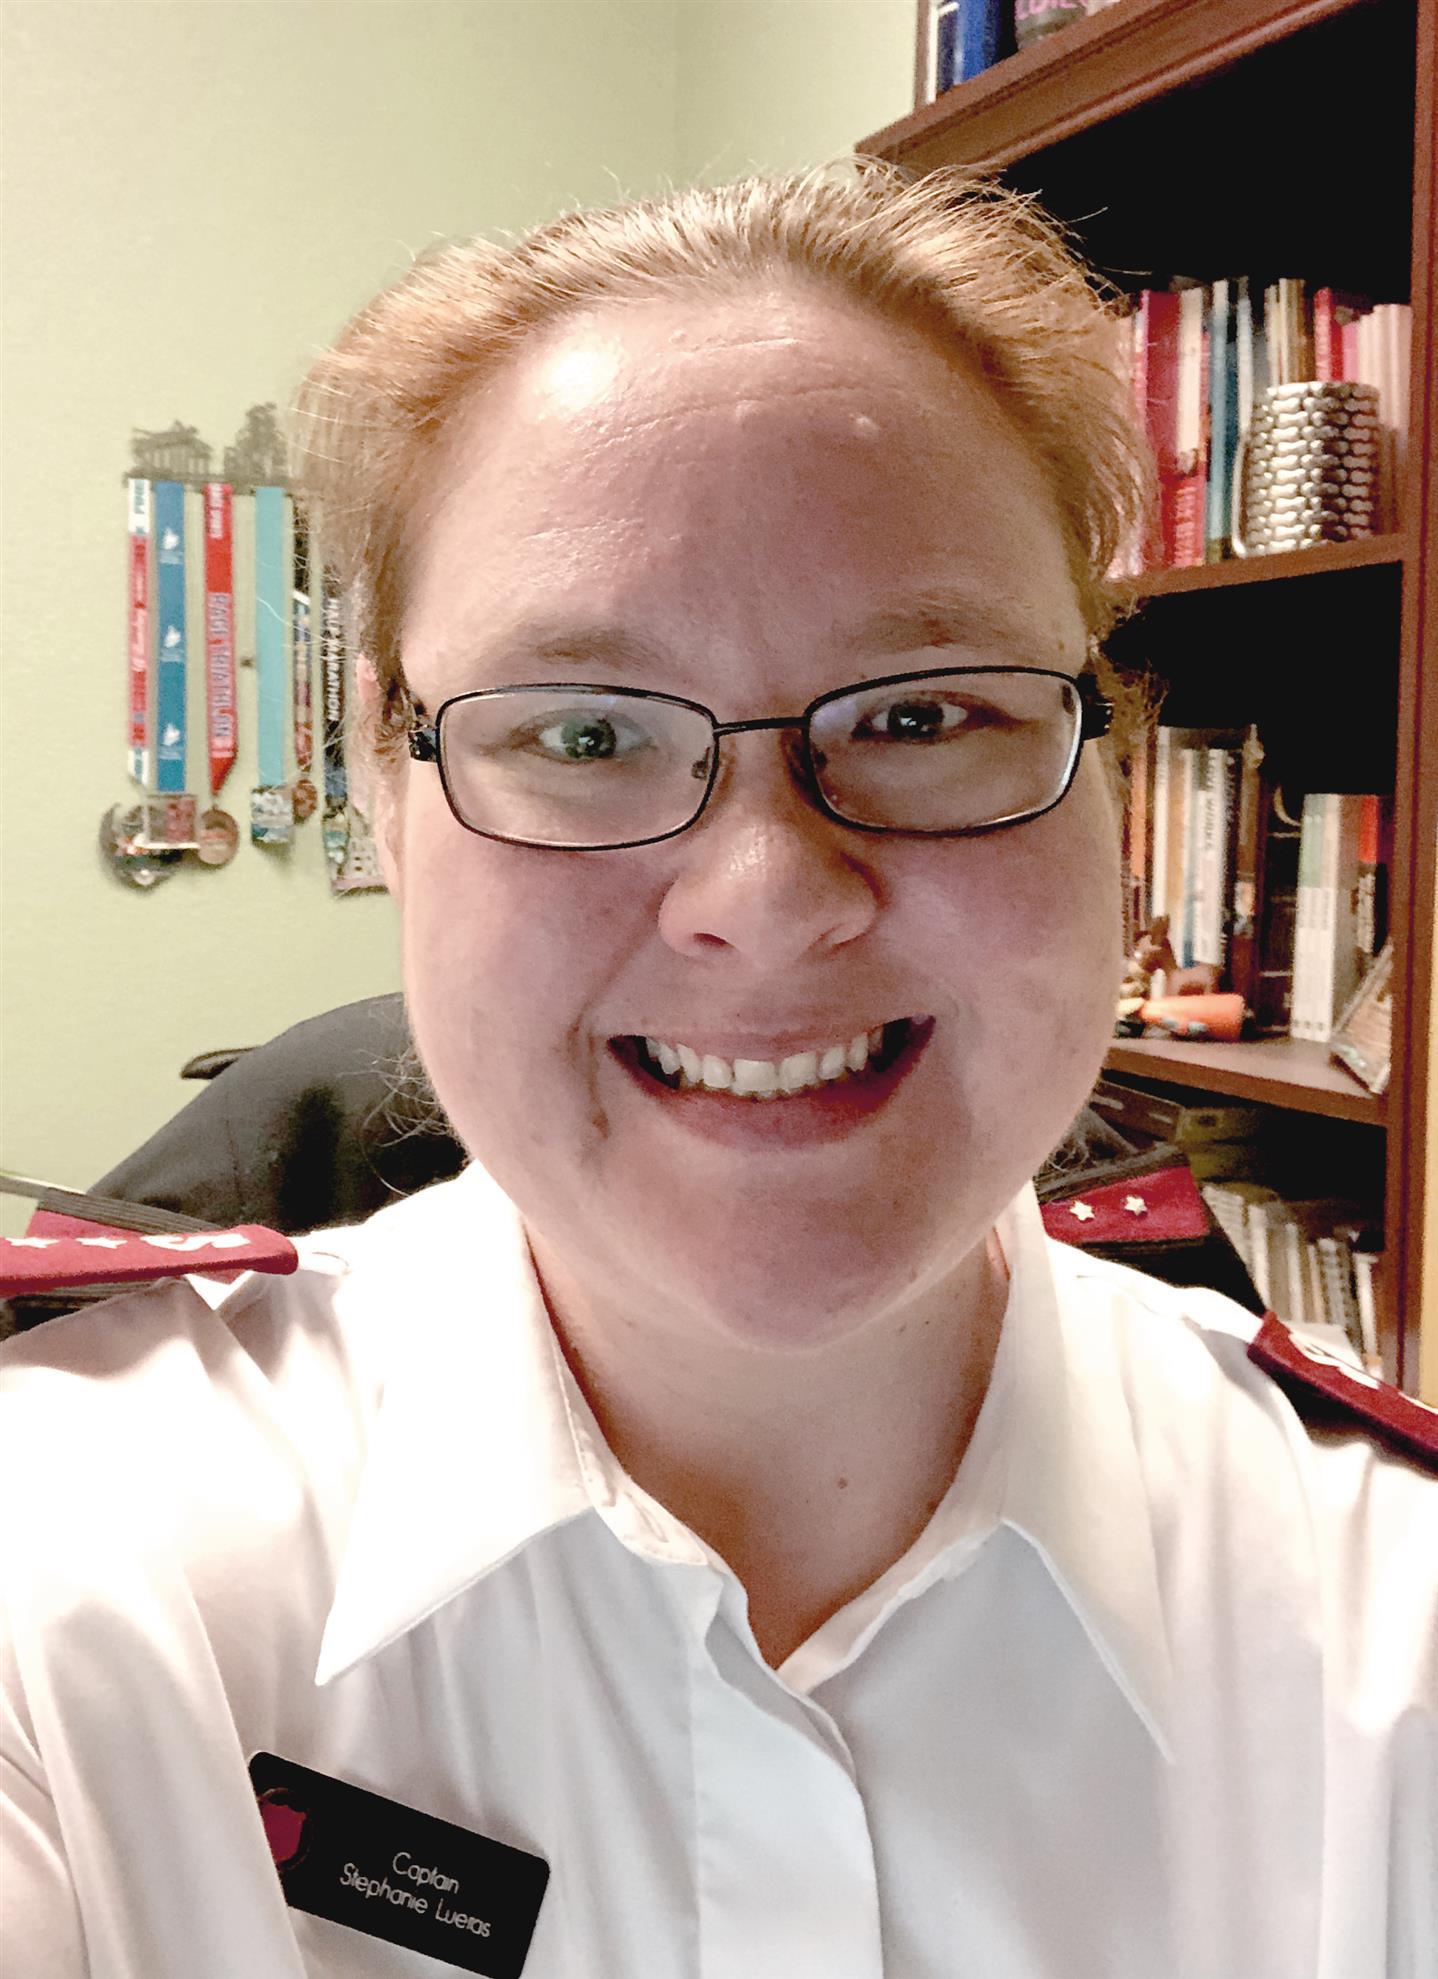 Captain Stephanie Lueras